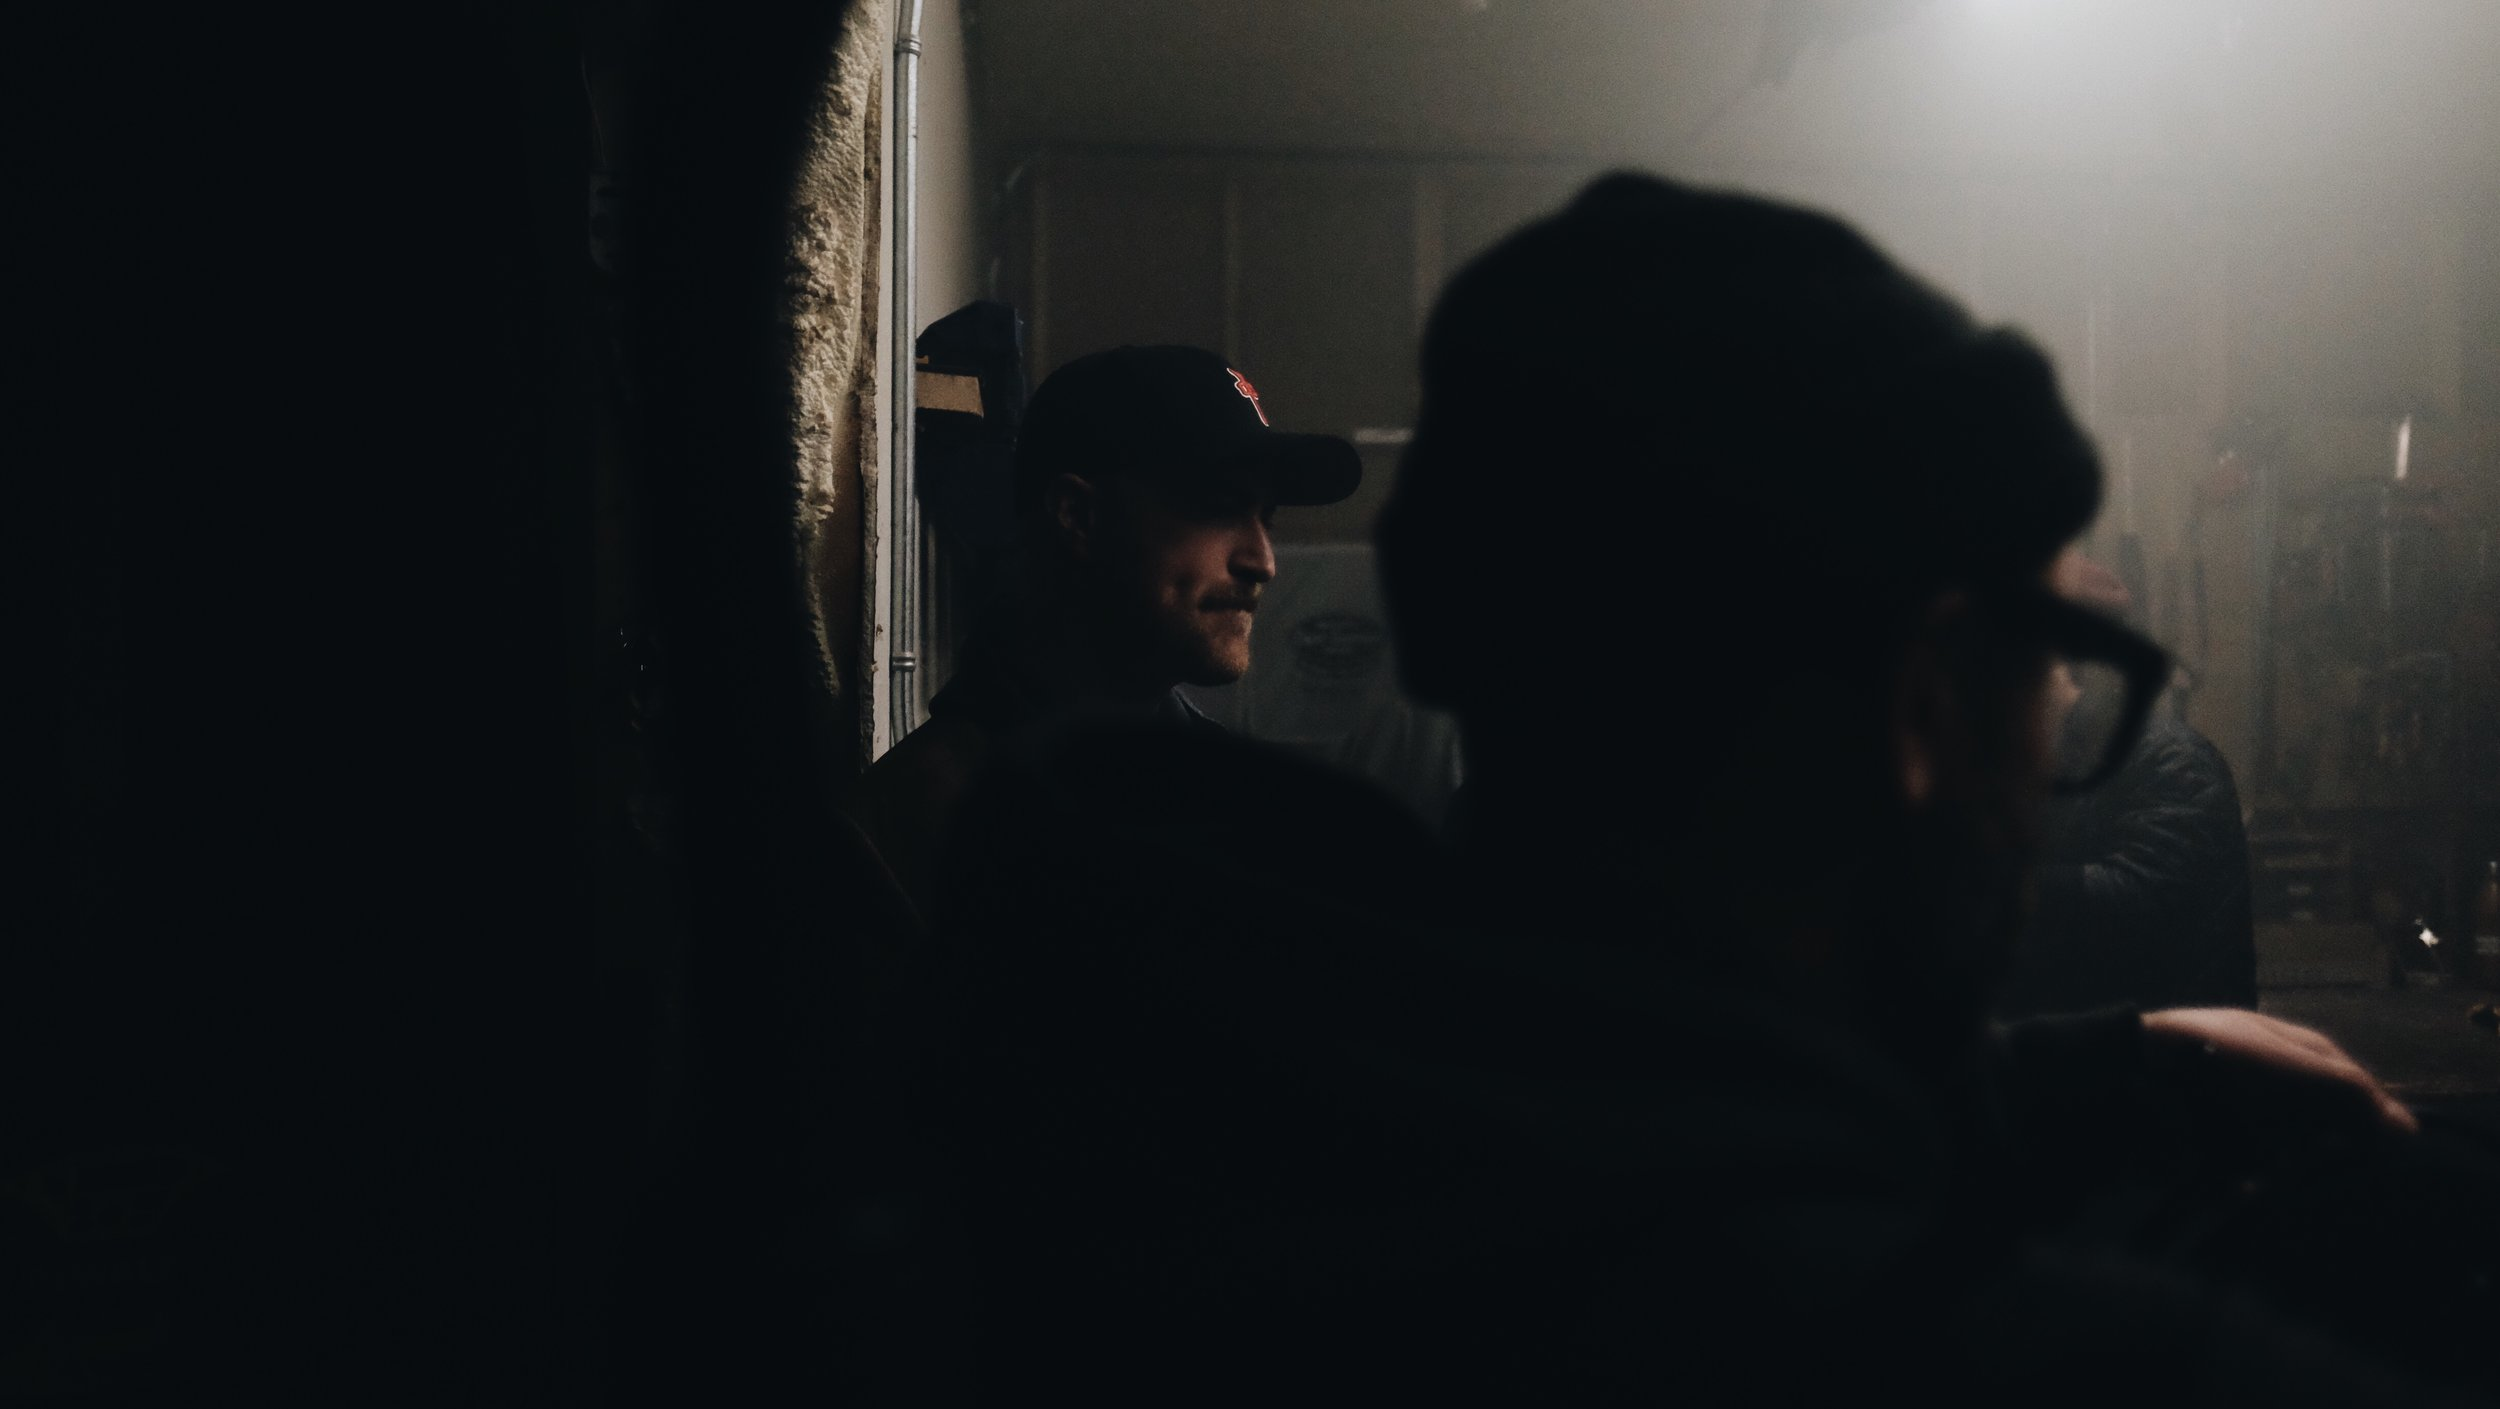 Chris Dowsett (Director) & Nick Thomas (Director of Photography)